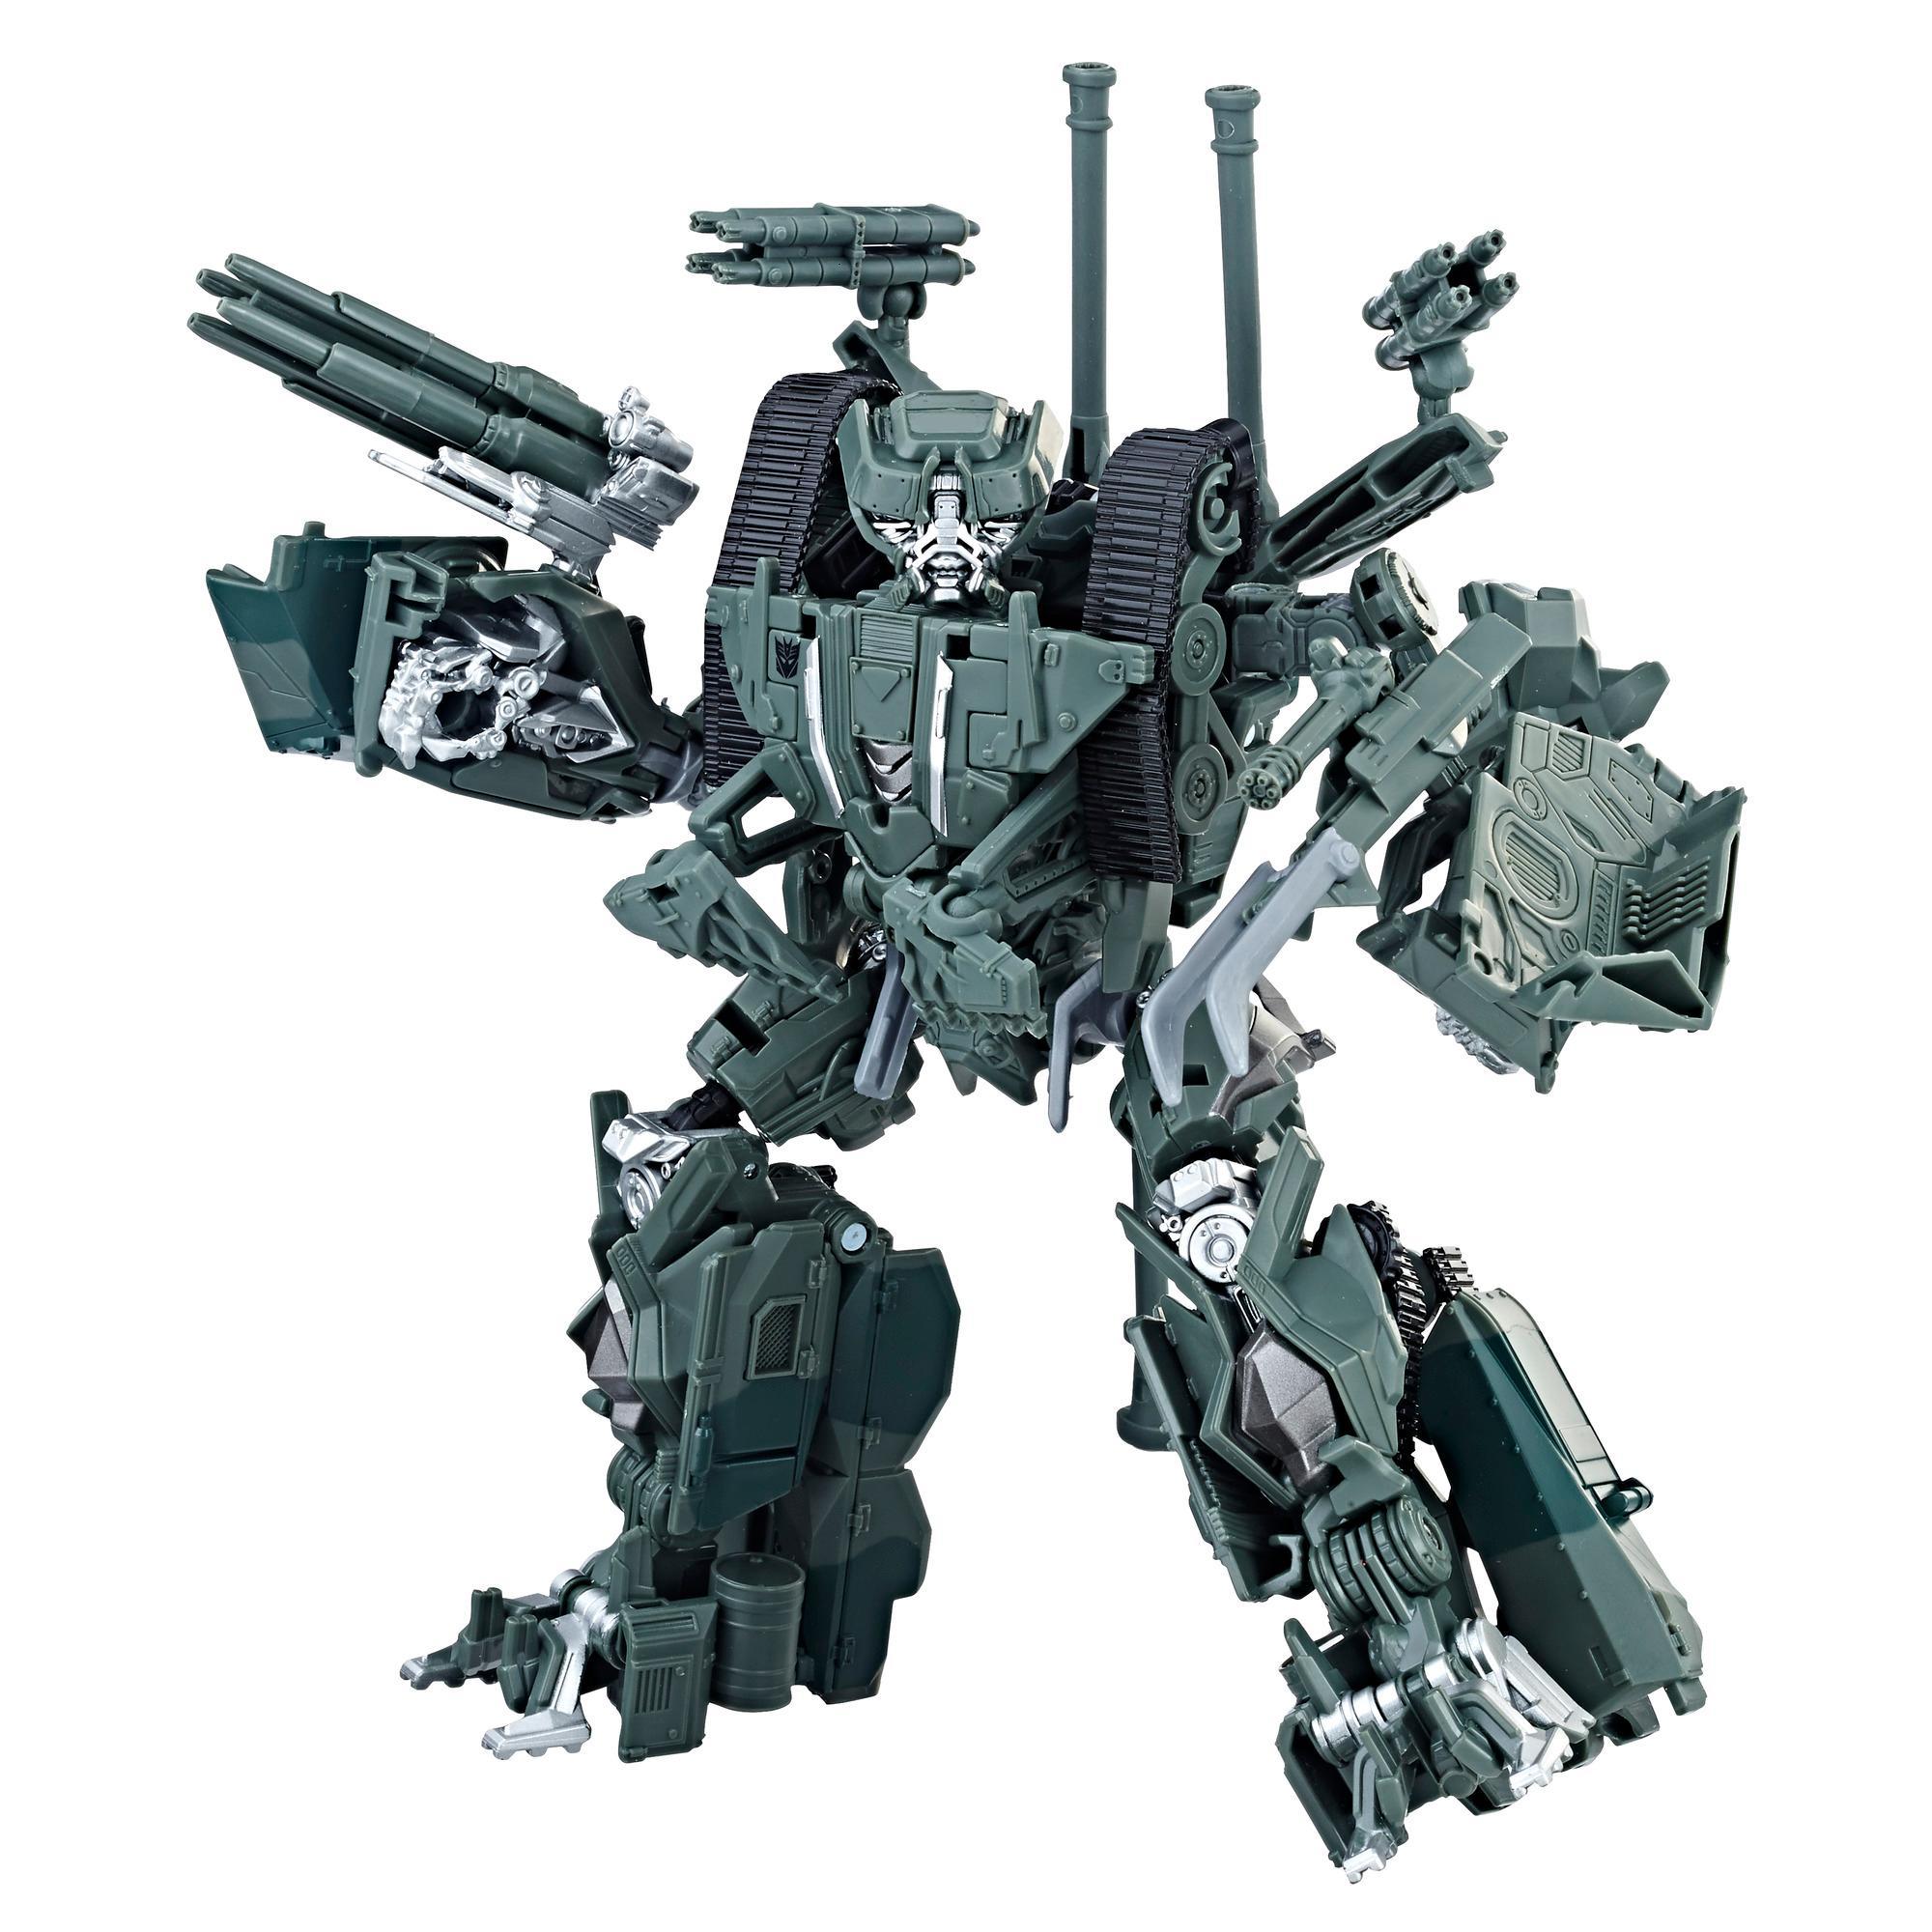 Transformers Studio Series - Decepticon Brawl 12 (Voyager Class)